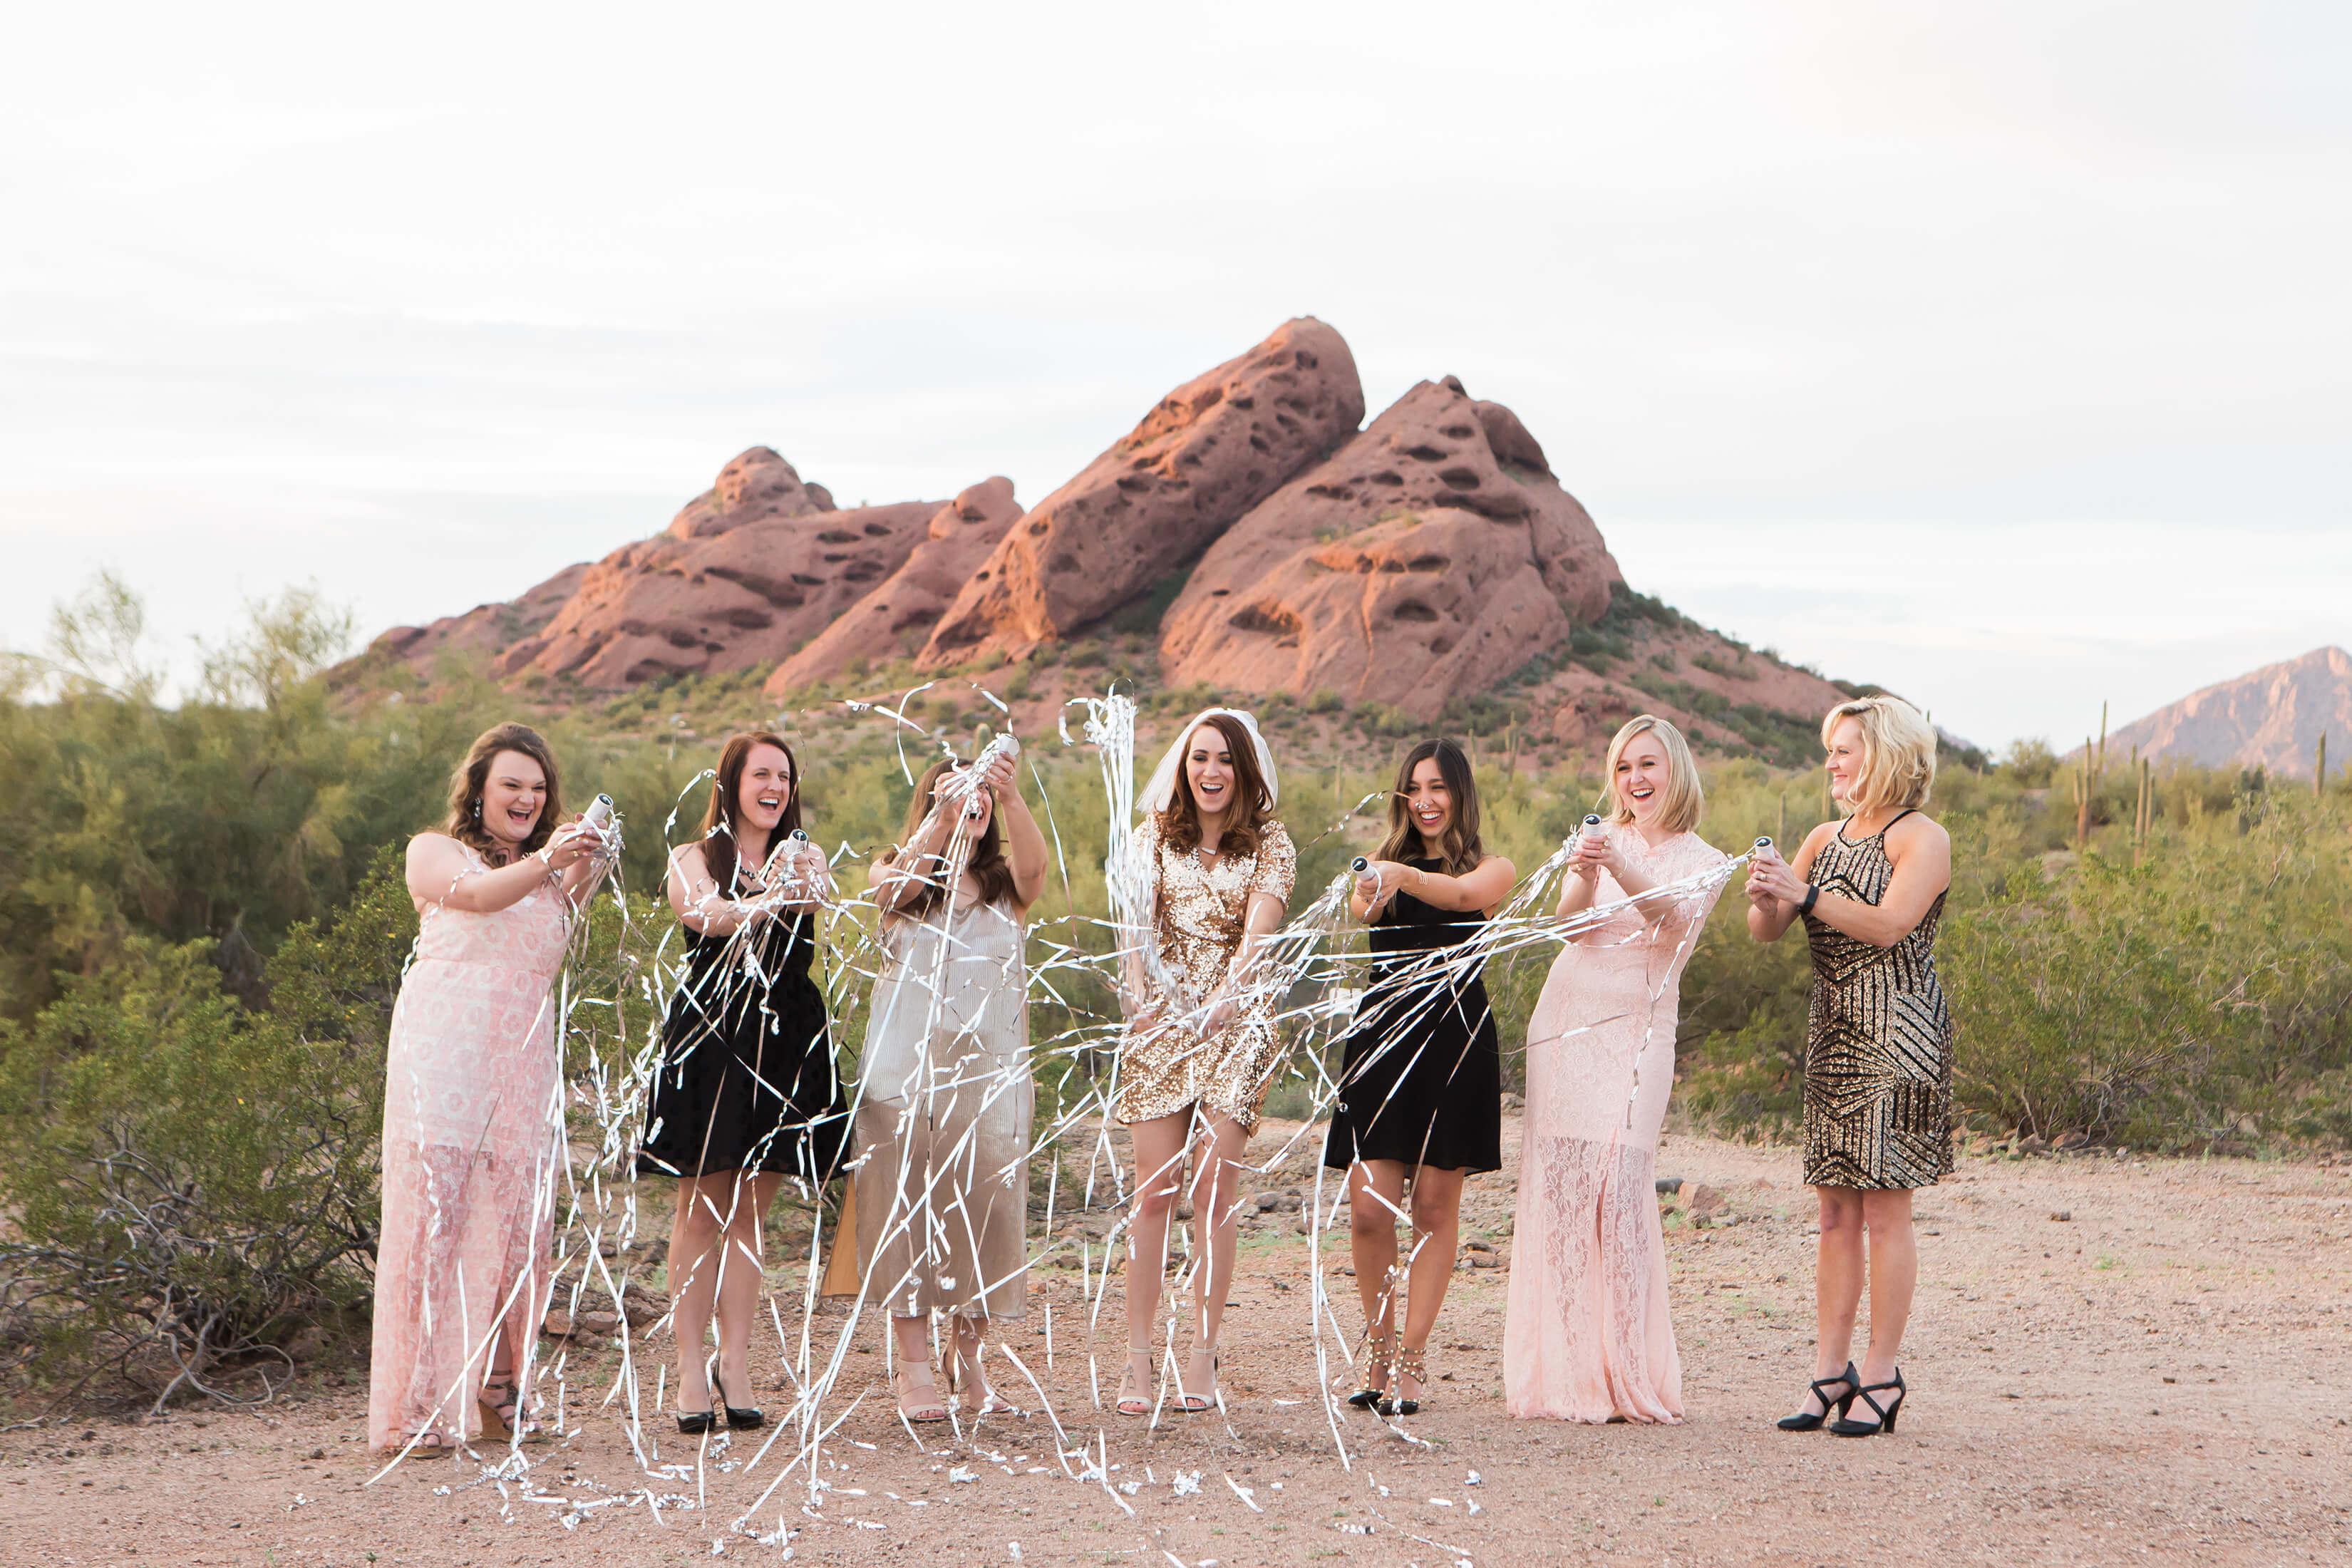 Bachelorette's opening a bottle of champagne in Scottsdale, Arizona